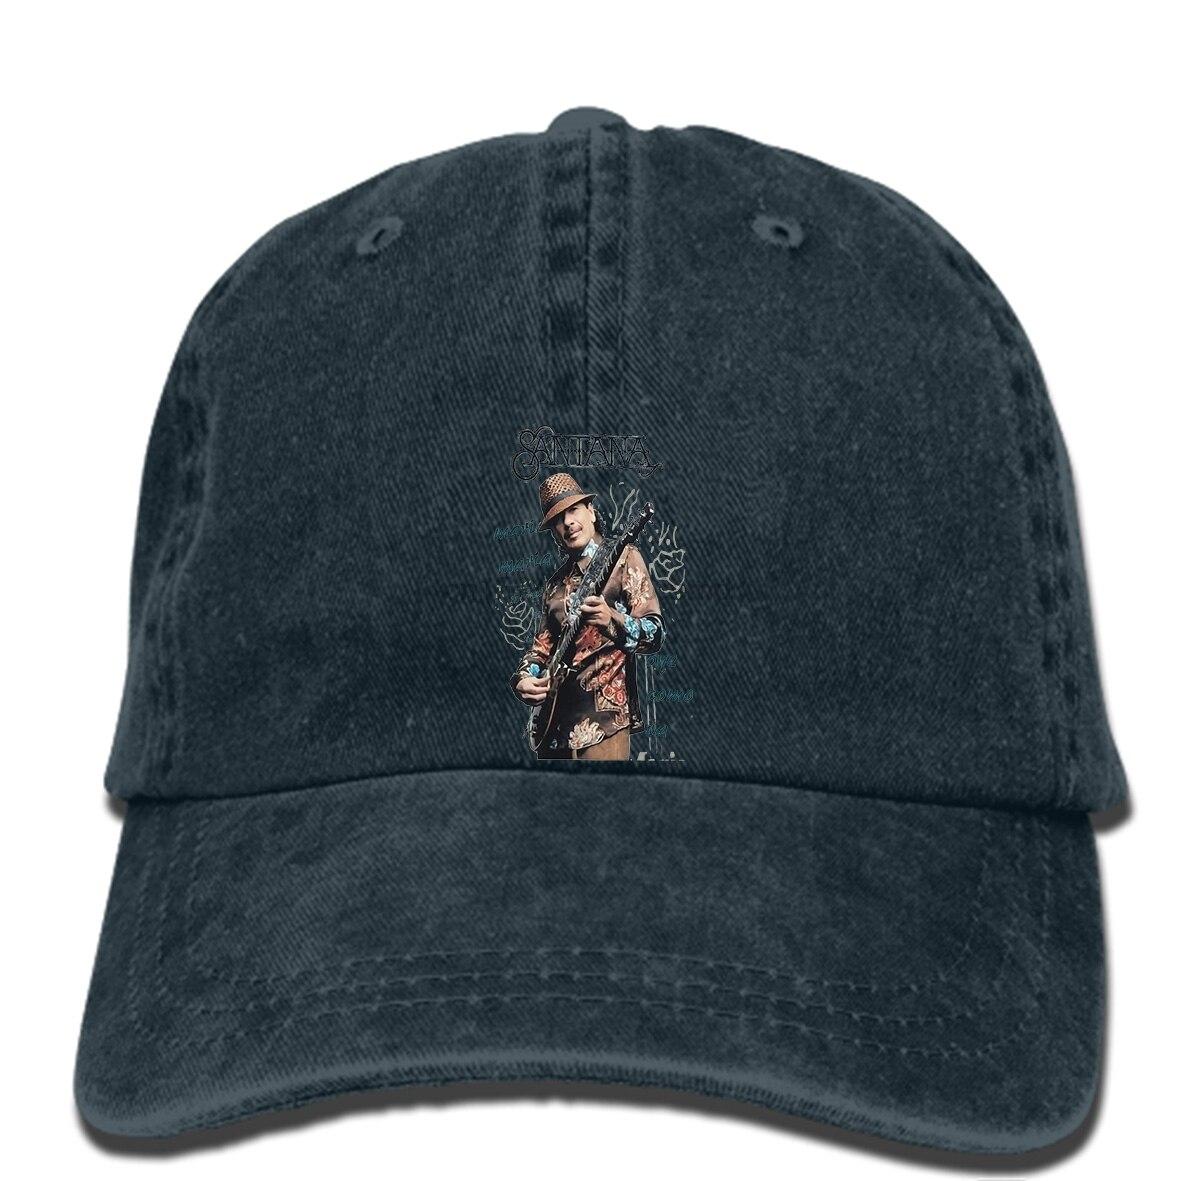 894c20f7cb5 hip hop Baseball caps Music Oye Carlos Santana hat Tour Concert Ance Guitar  Mans Unique s cap-in Baseball Caps from Apparel Accessories on  Aliexpress.com ...